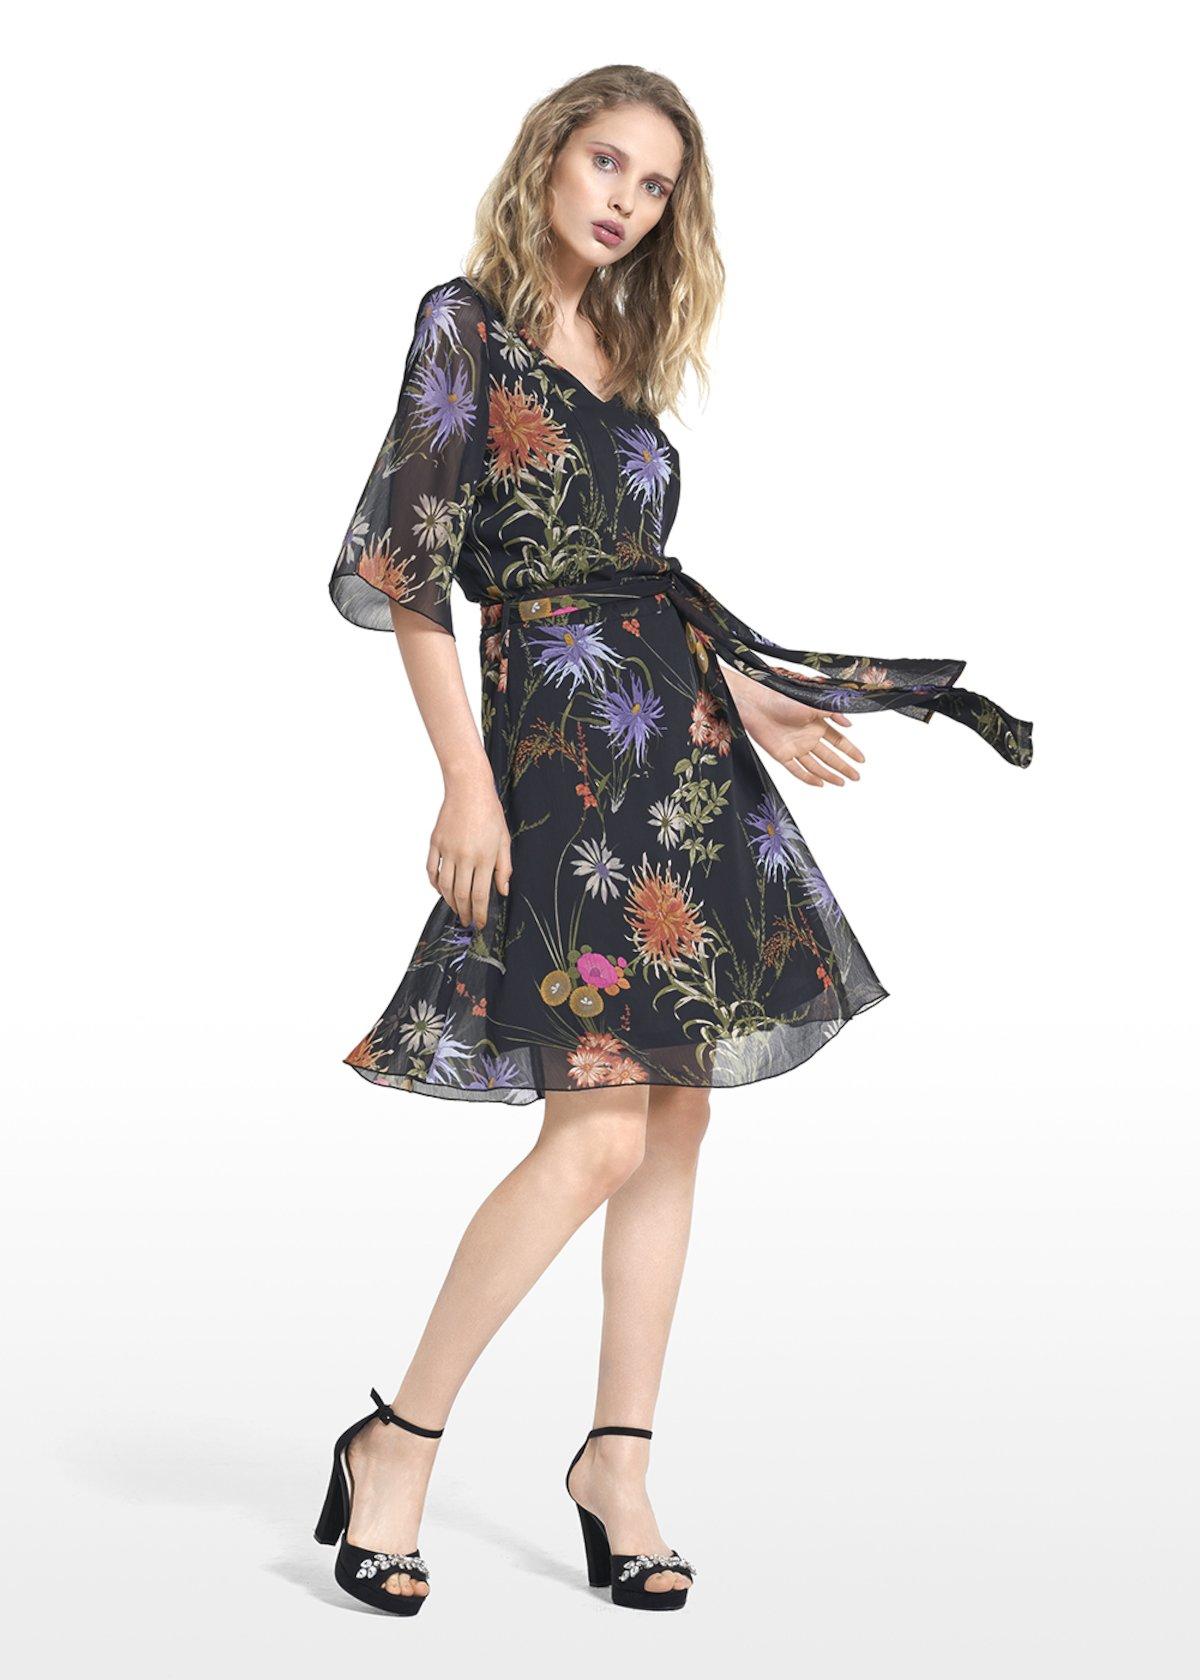 Angel dress in floral print georgette - Black\ Oca\ Fantasia - Woman